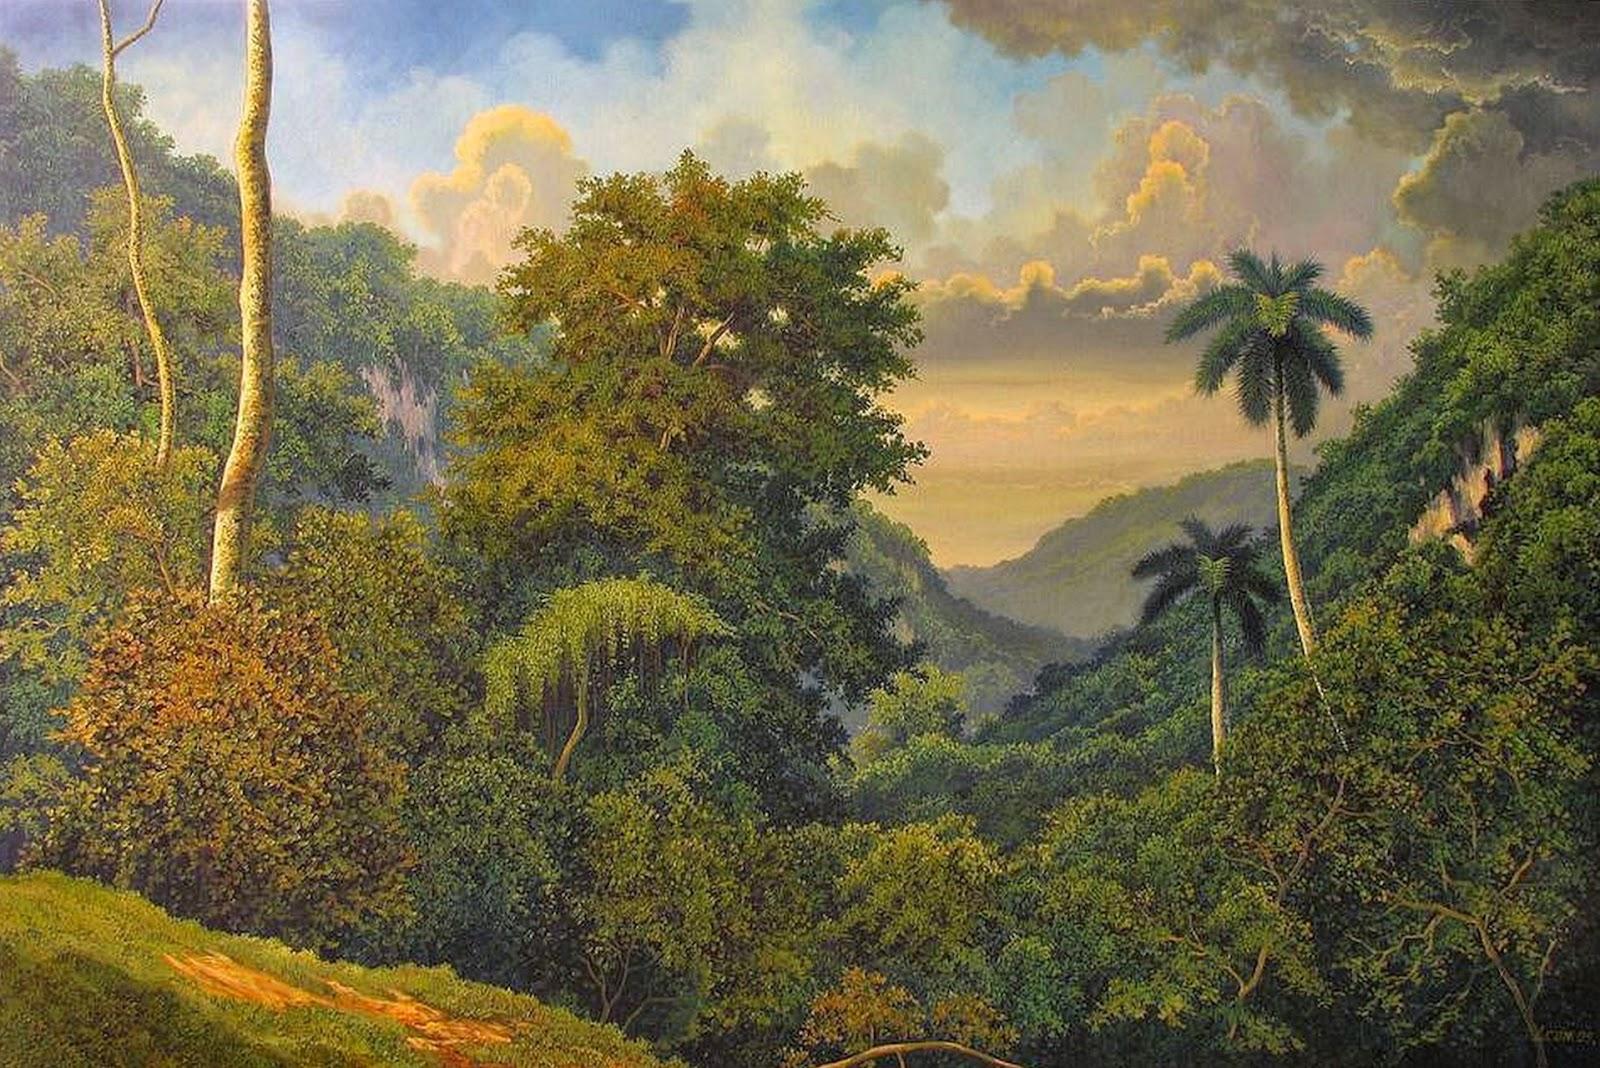 vistas-de-paisajes-naturales